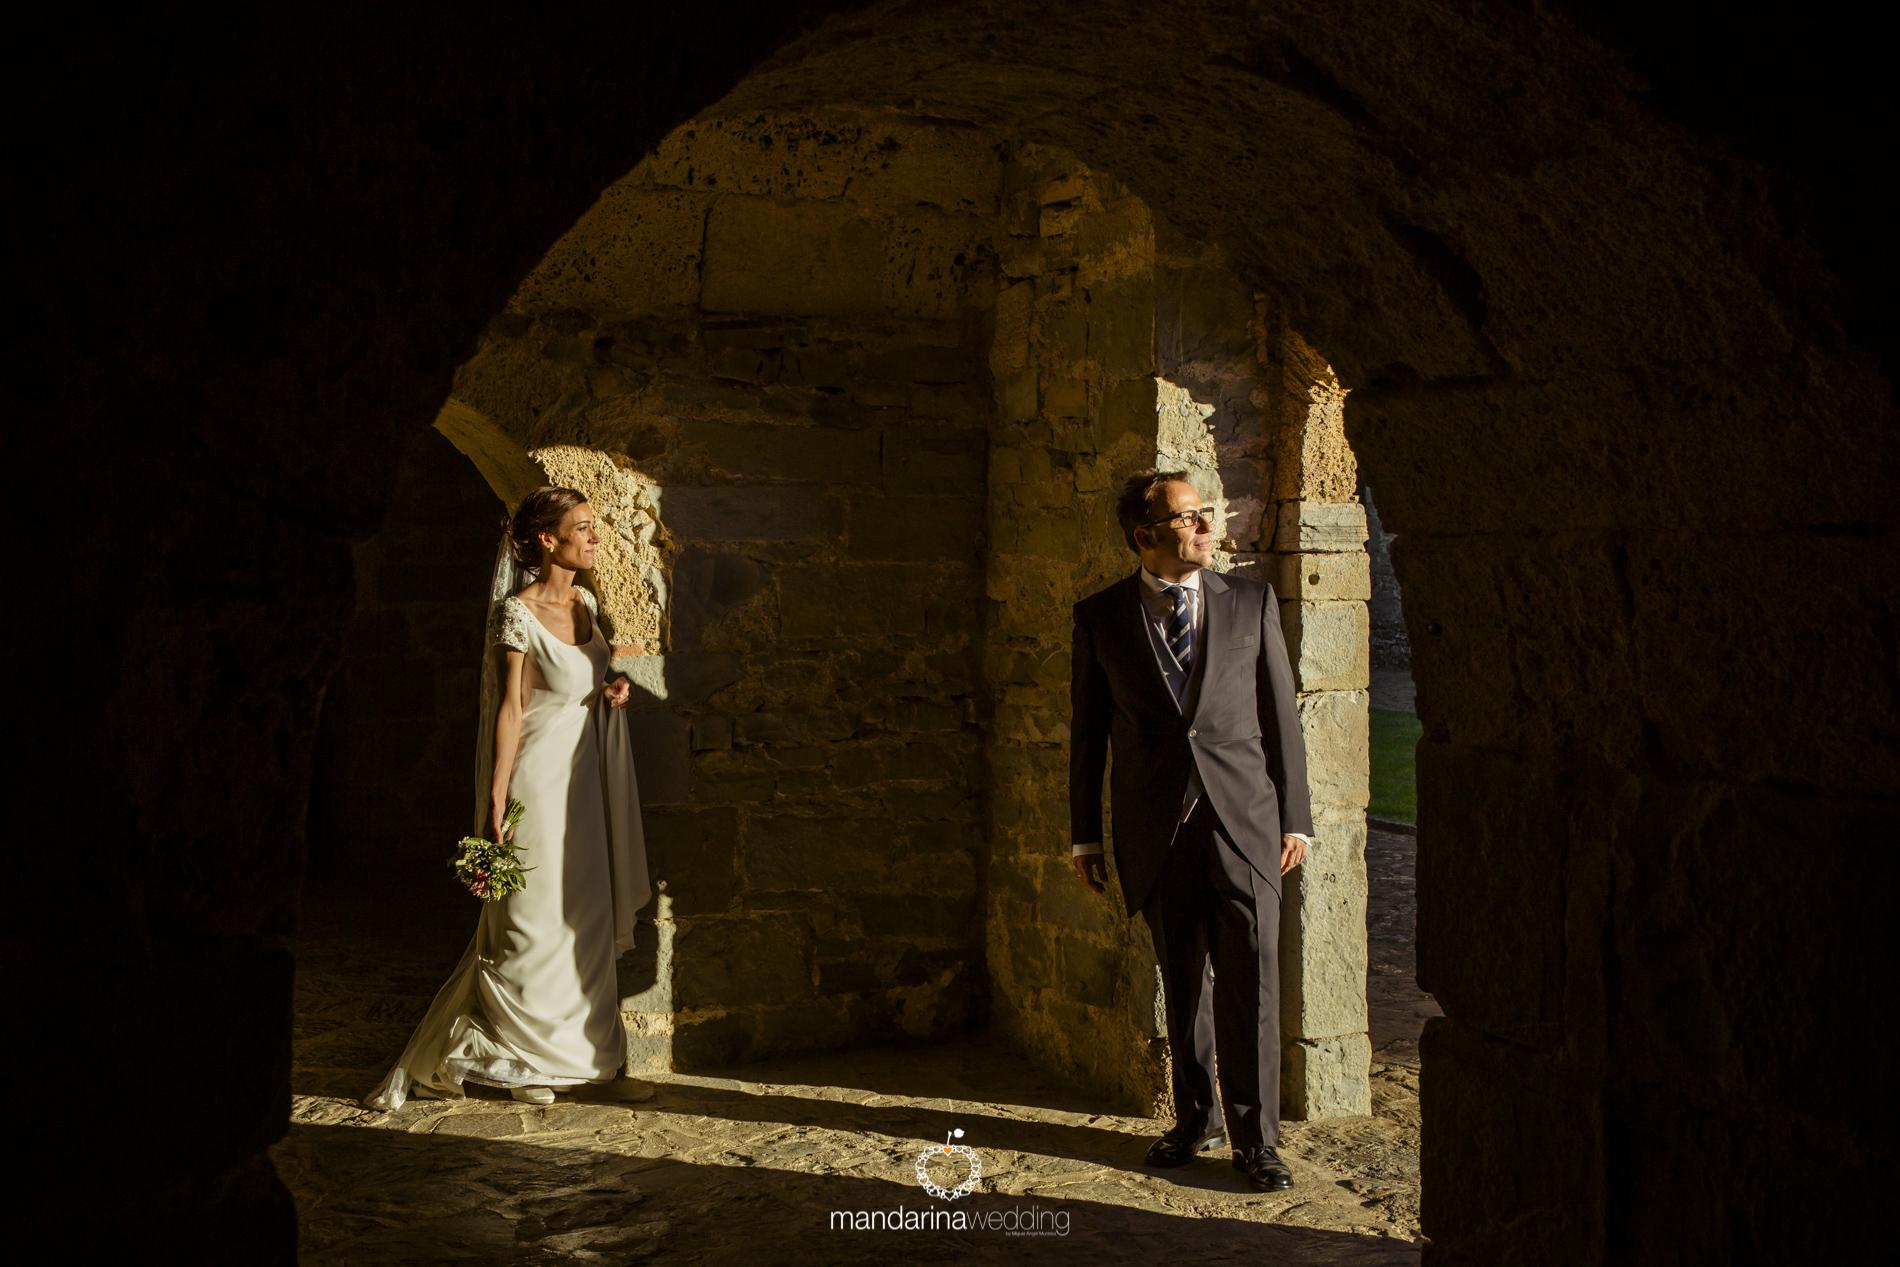 mandaria wedding, fotografos de boda, fotoperiodismo de boda, mejores fotografos de boda, bodas soria, bodas pirineo, bodas Madrid, fotógrafos tarragona_26